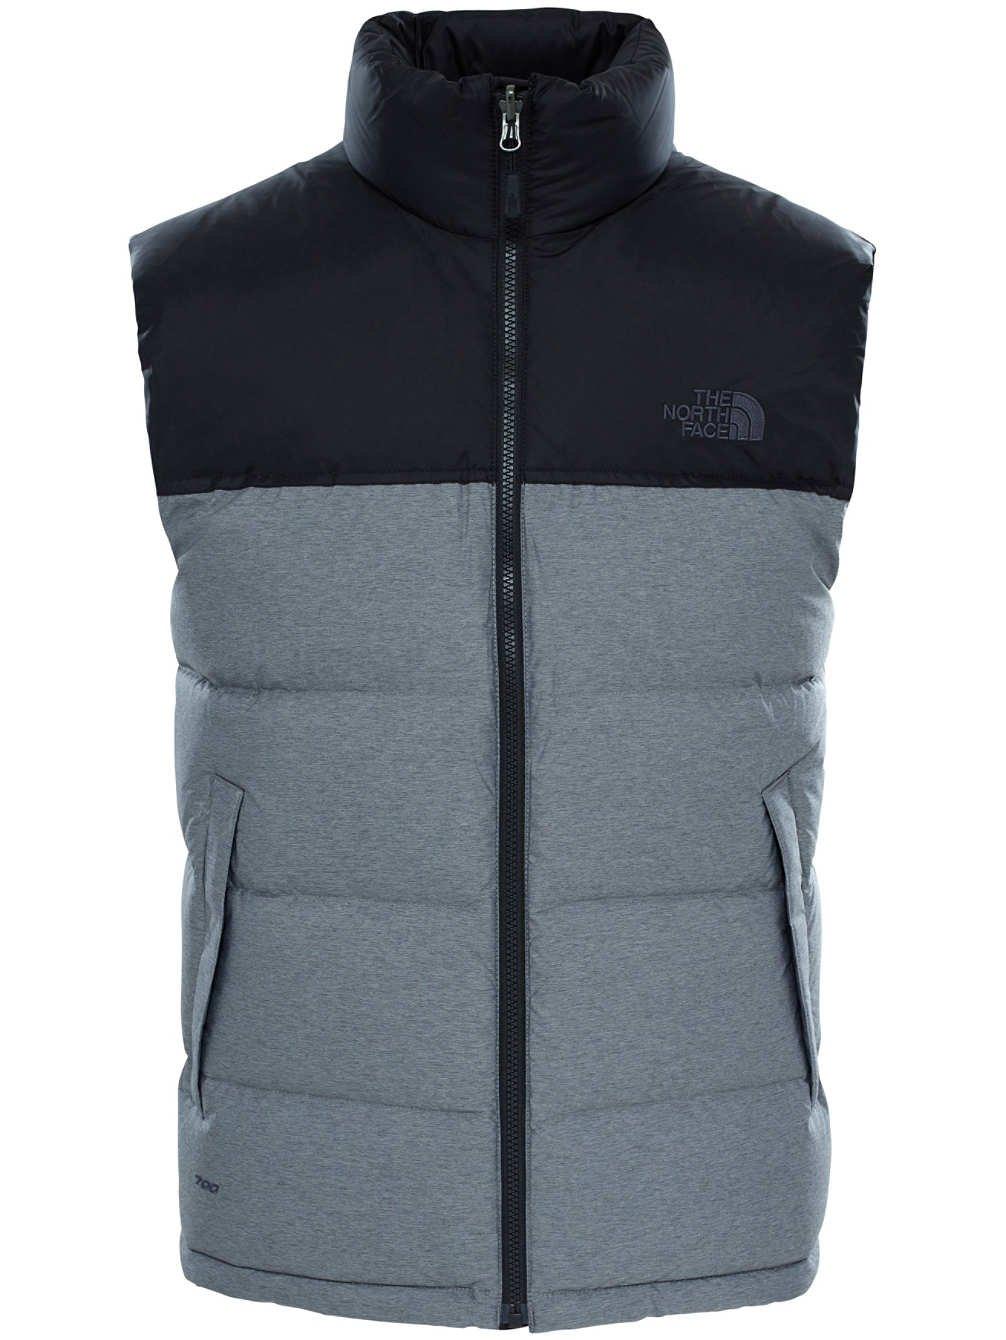 The North Face Nuptse Vest Mens (XX-Large, TNF Medium Grey Heather/TNF Black)